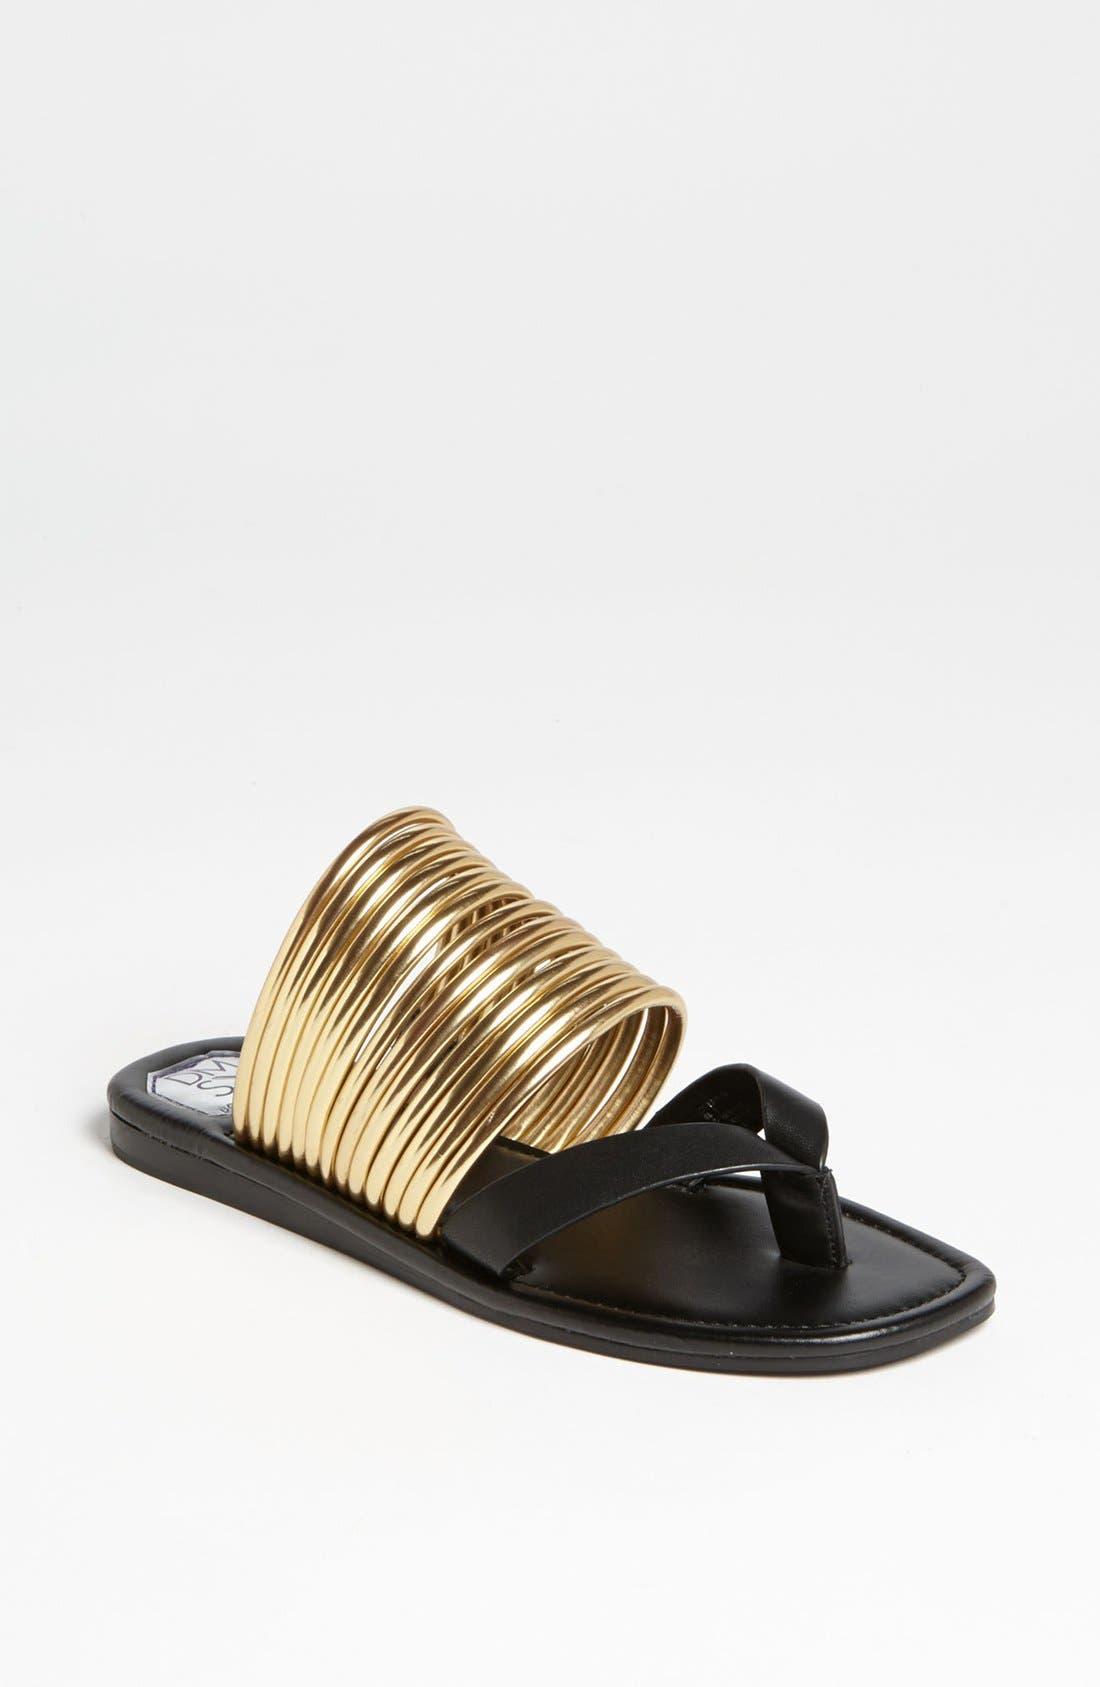 Alternate Image 1 Selected - DMSX Donald J Pliner 'Crysta' Sandal